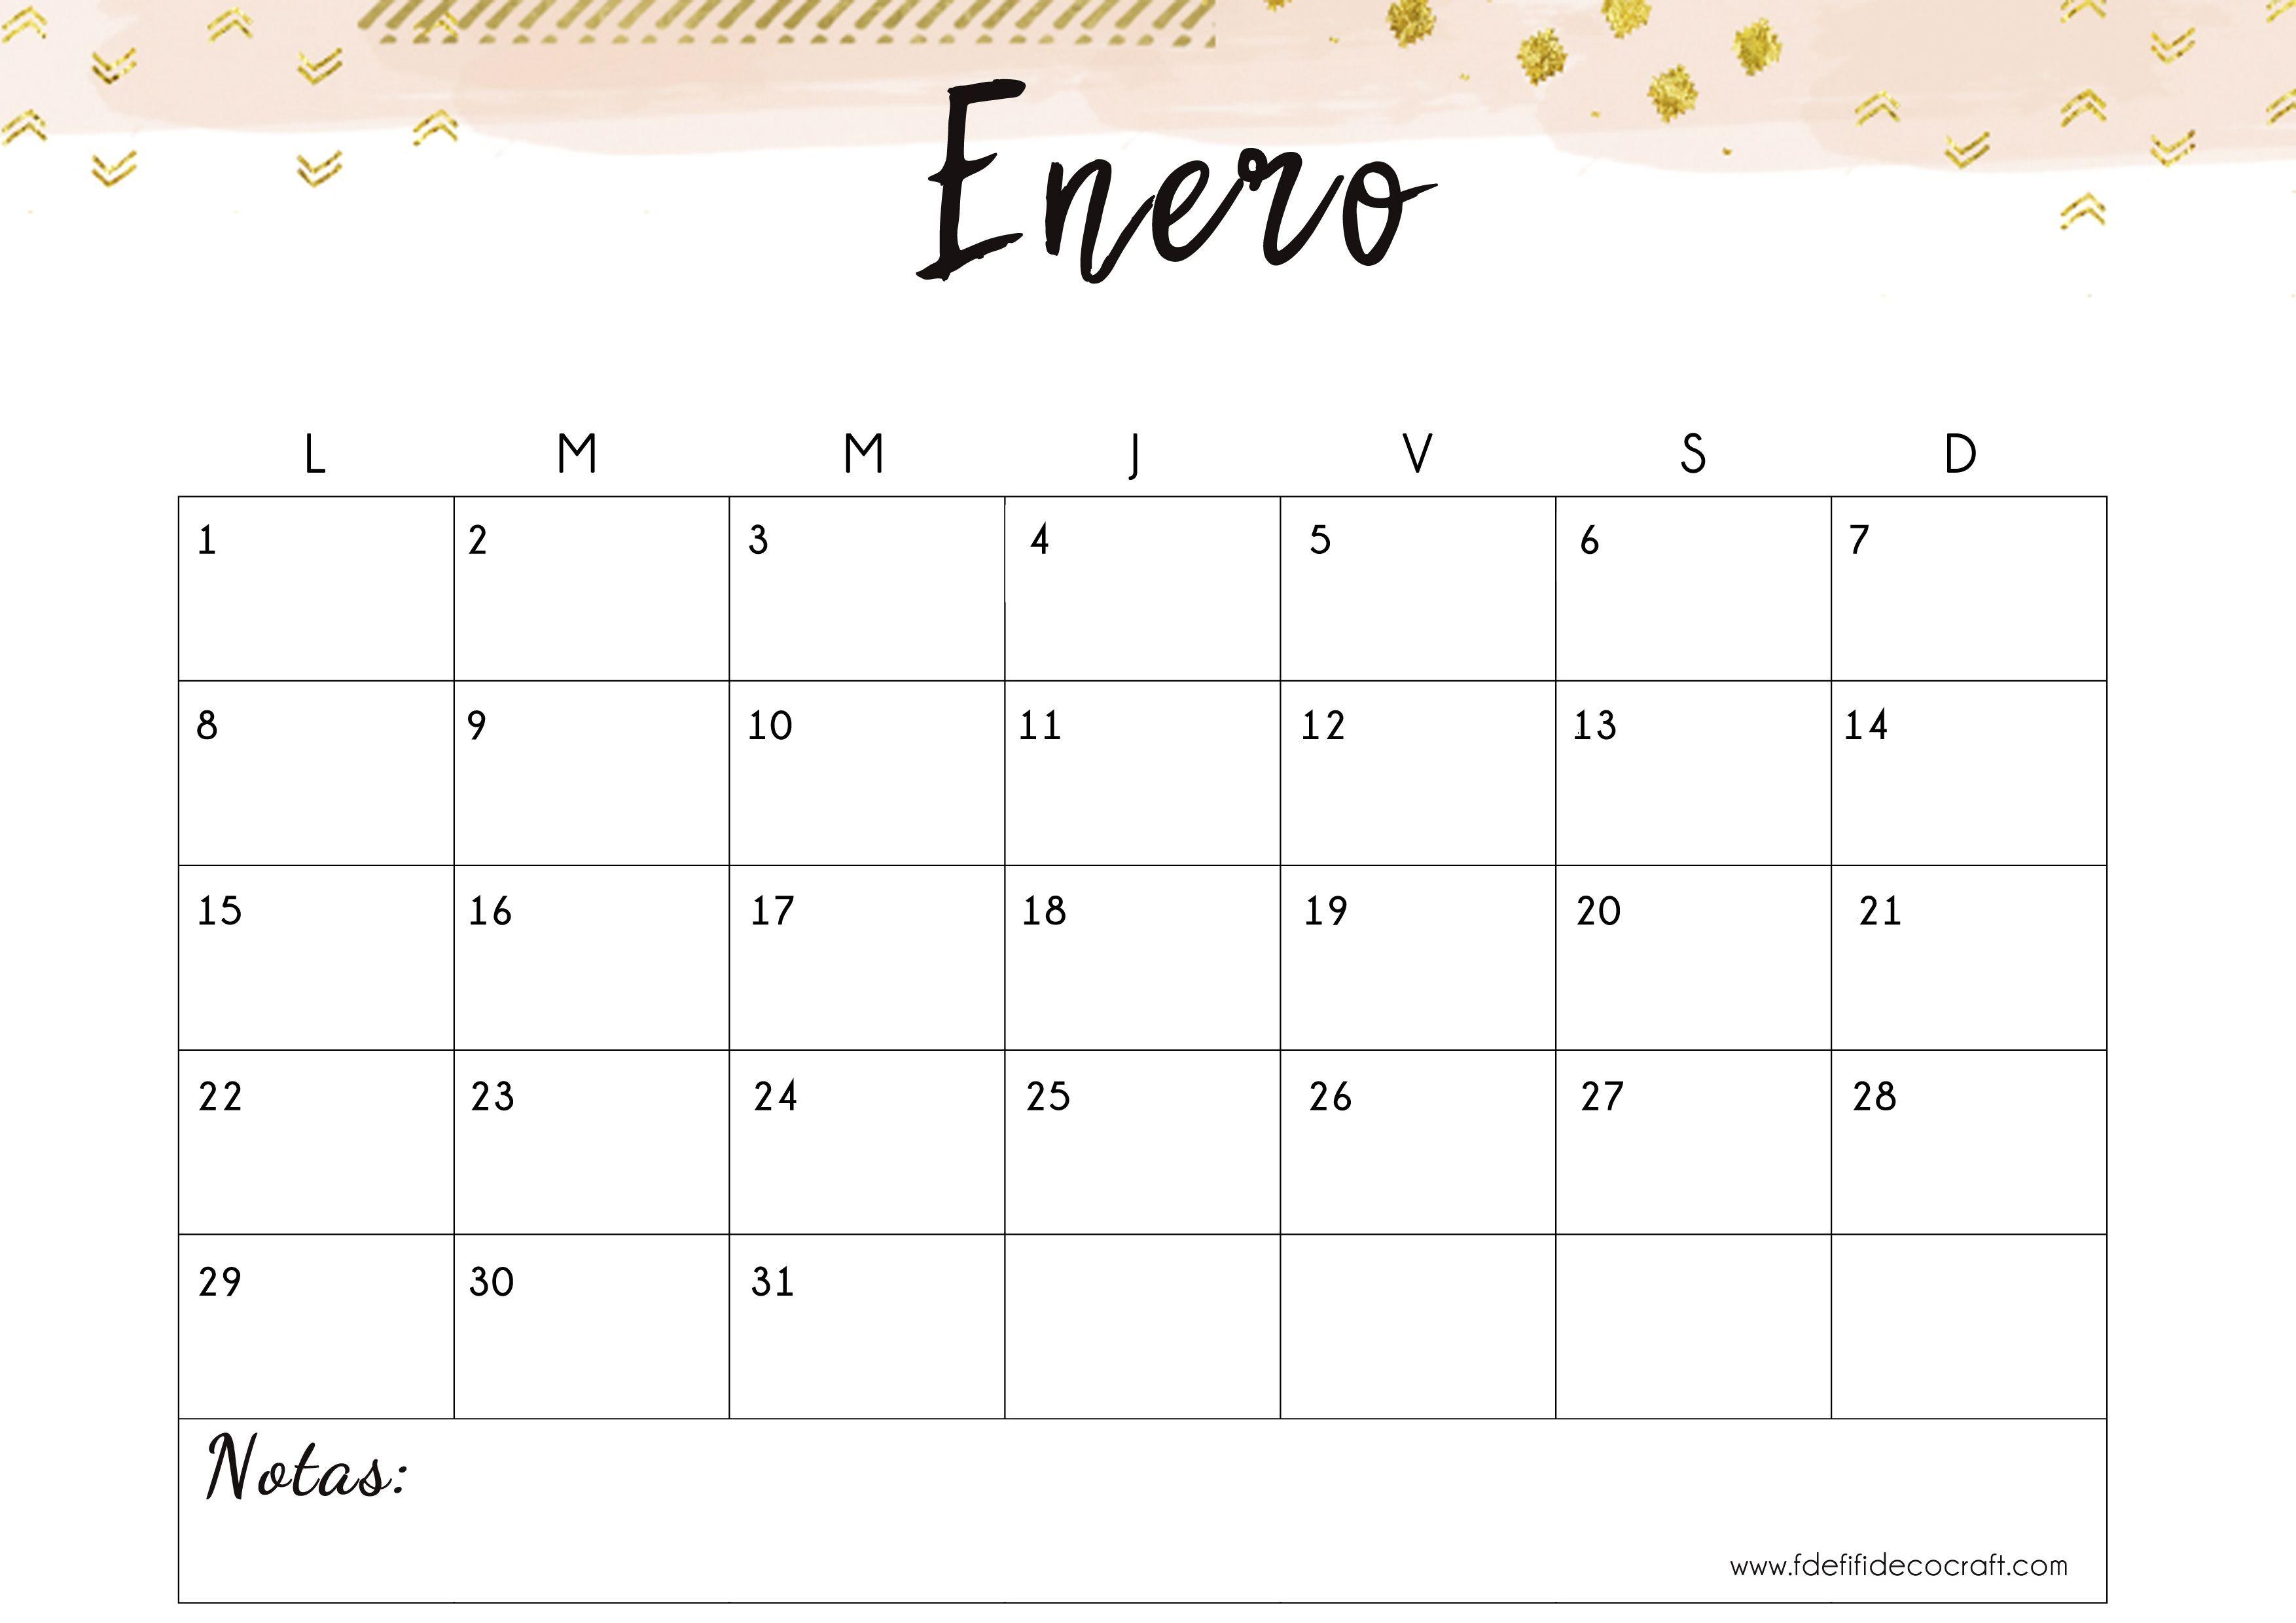 Imprimir Calendario 2019 Con Festivos Más Populares sorpresa Tu Calendario Descargable Gratuito Para 2018 Of Imprimir Calendario 2019 Con Festivos Más Caliente Calendario 2017